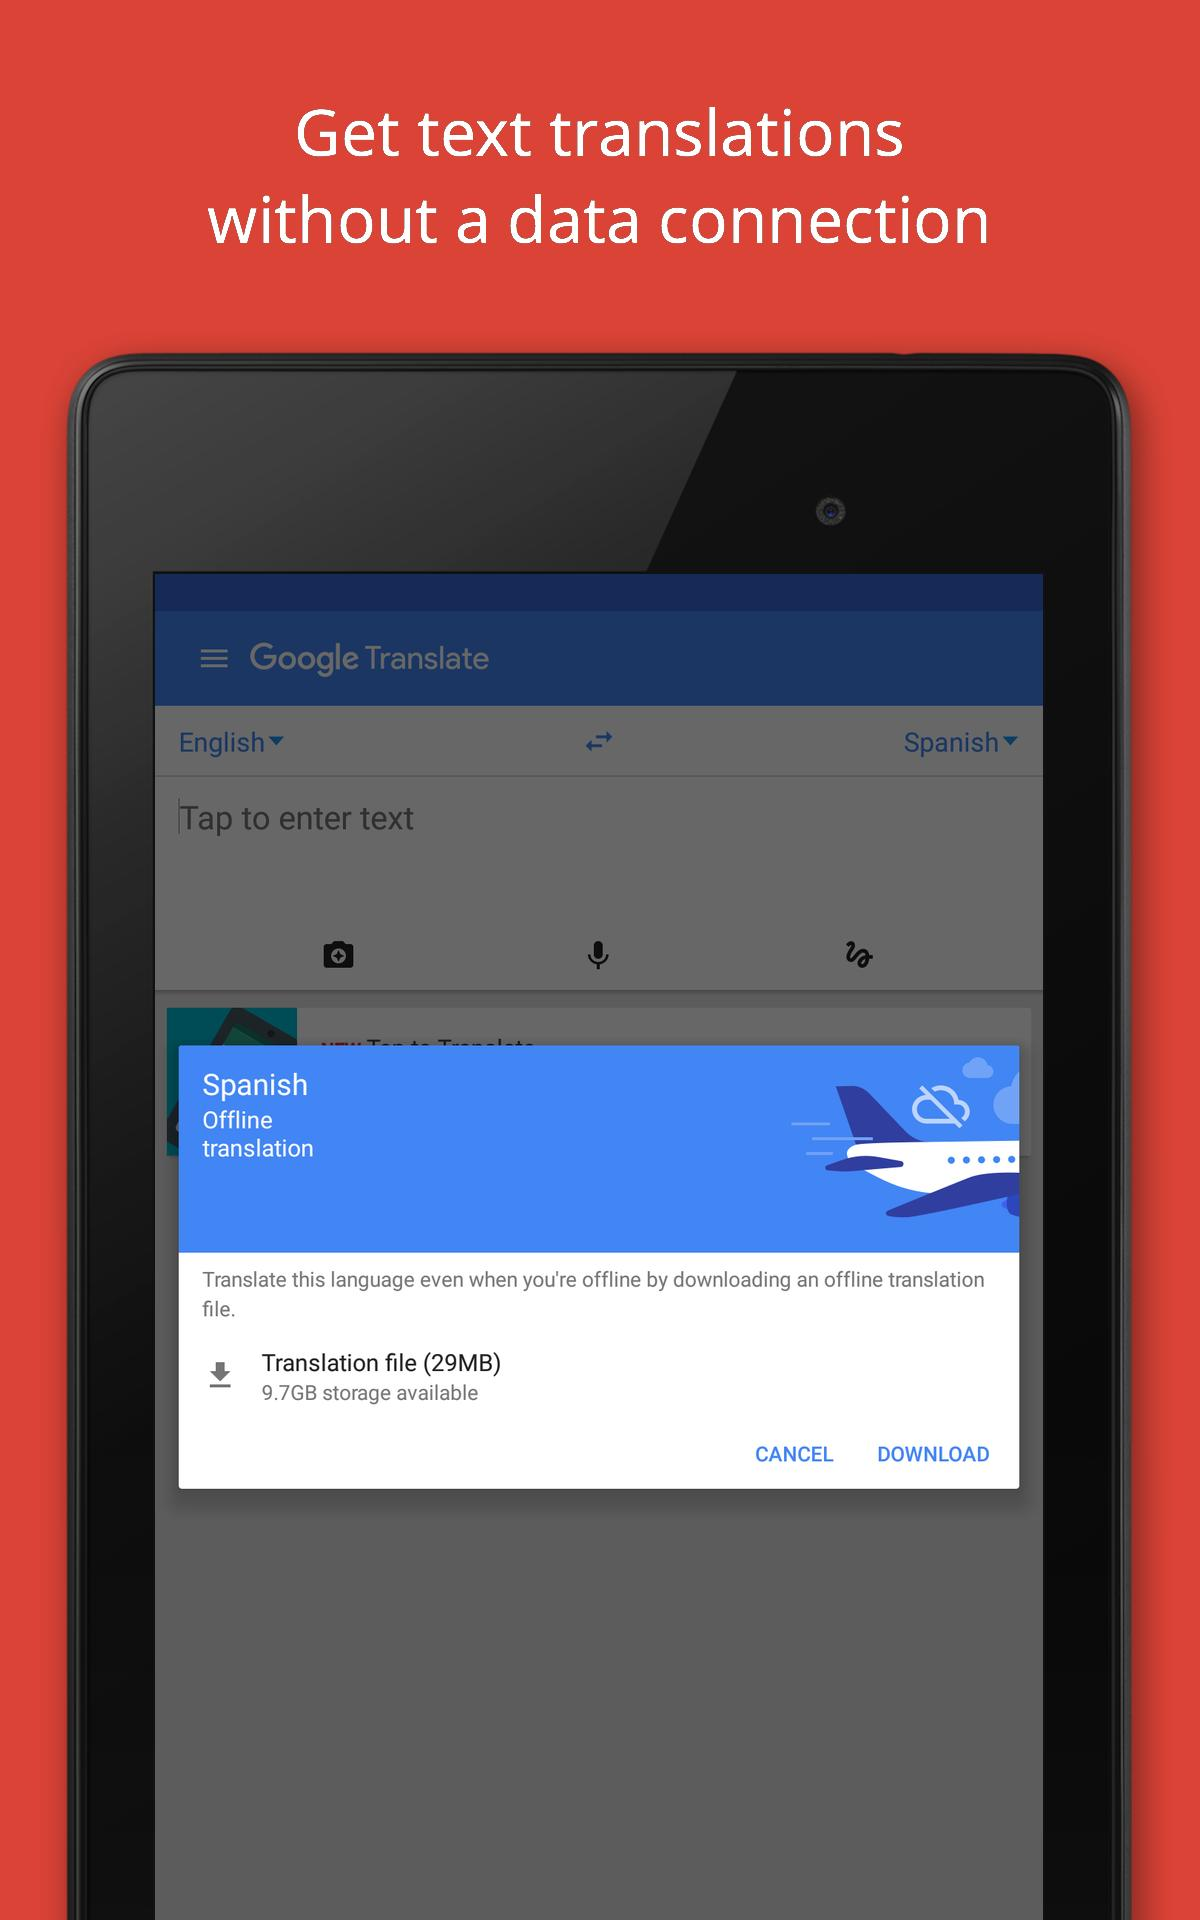 Google Translate 6.14.0.03.342186690 Screenshot 13